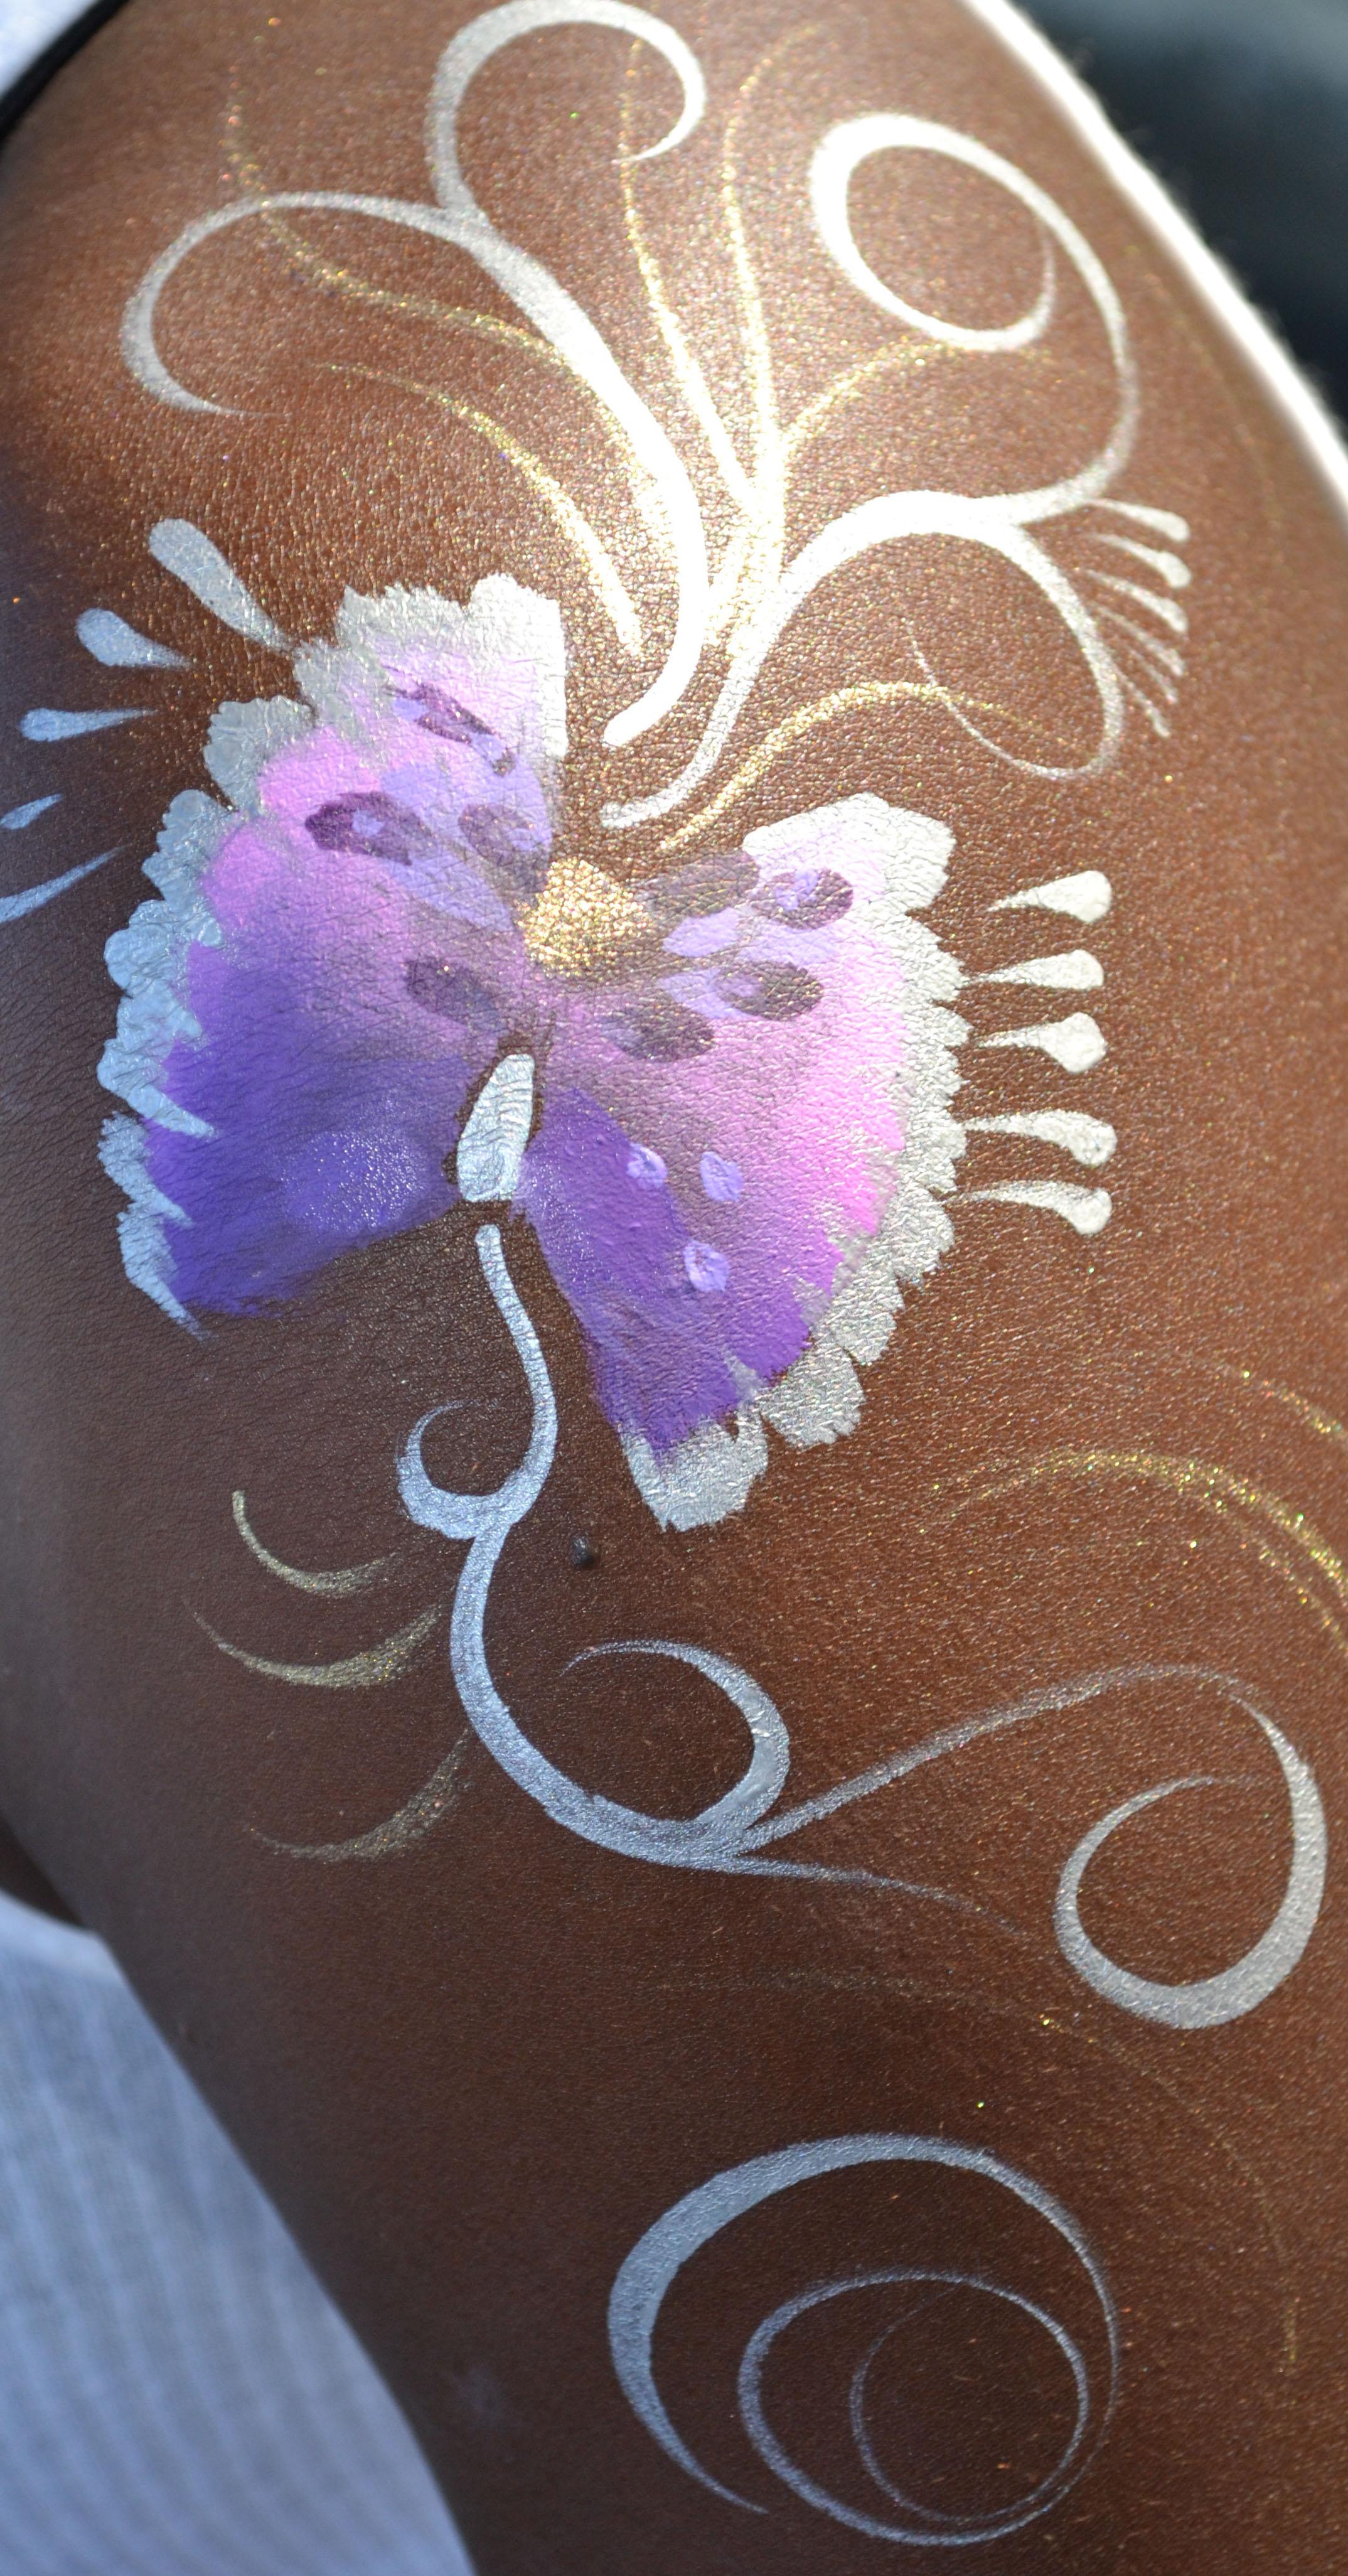 50 shades of purple 15.JPG